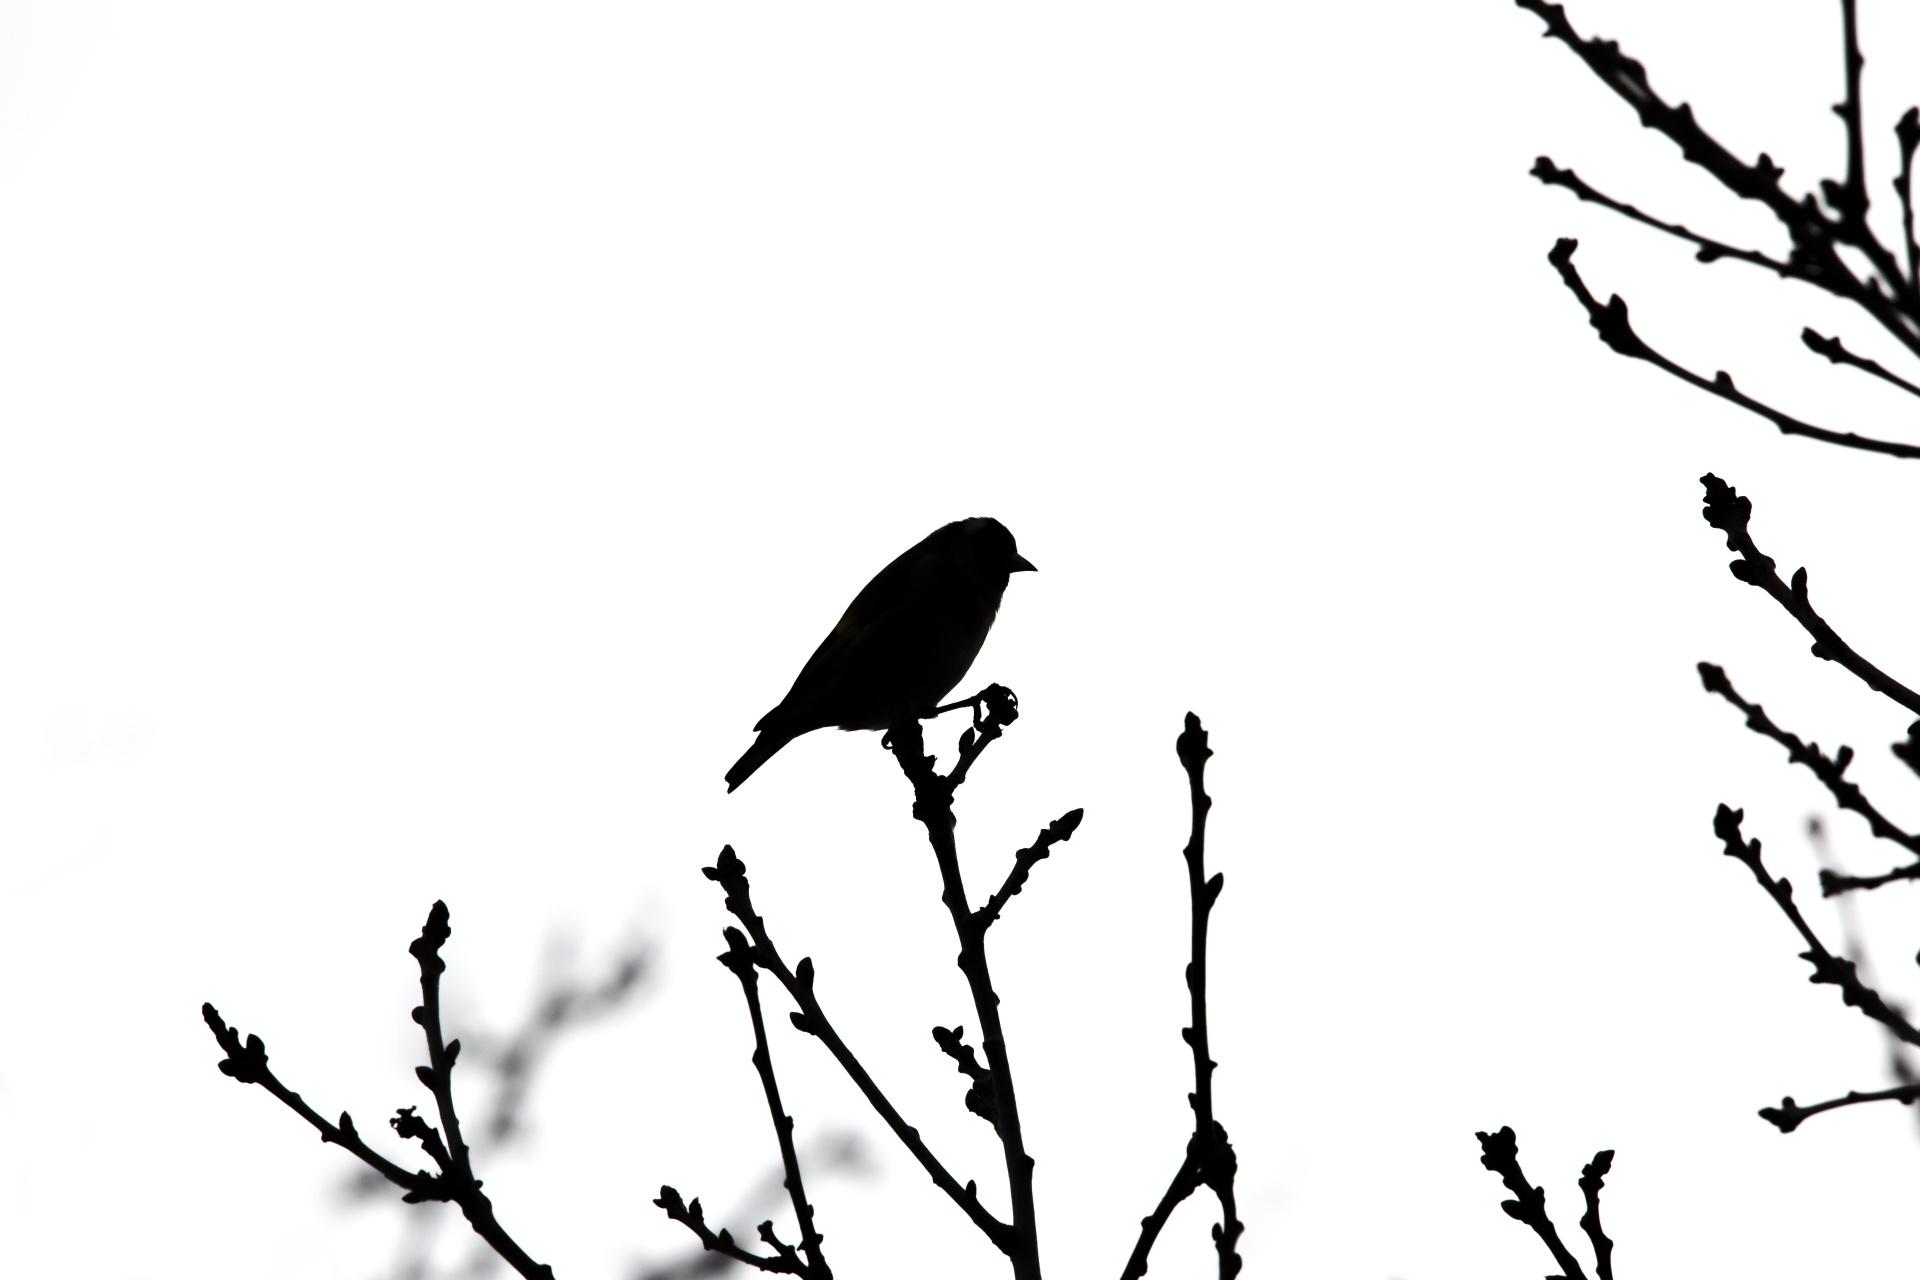 1920x1280 Bird Silhouette Free Stock Photo